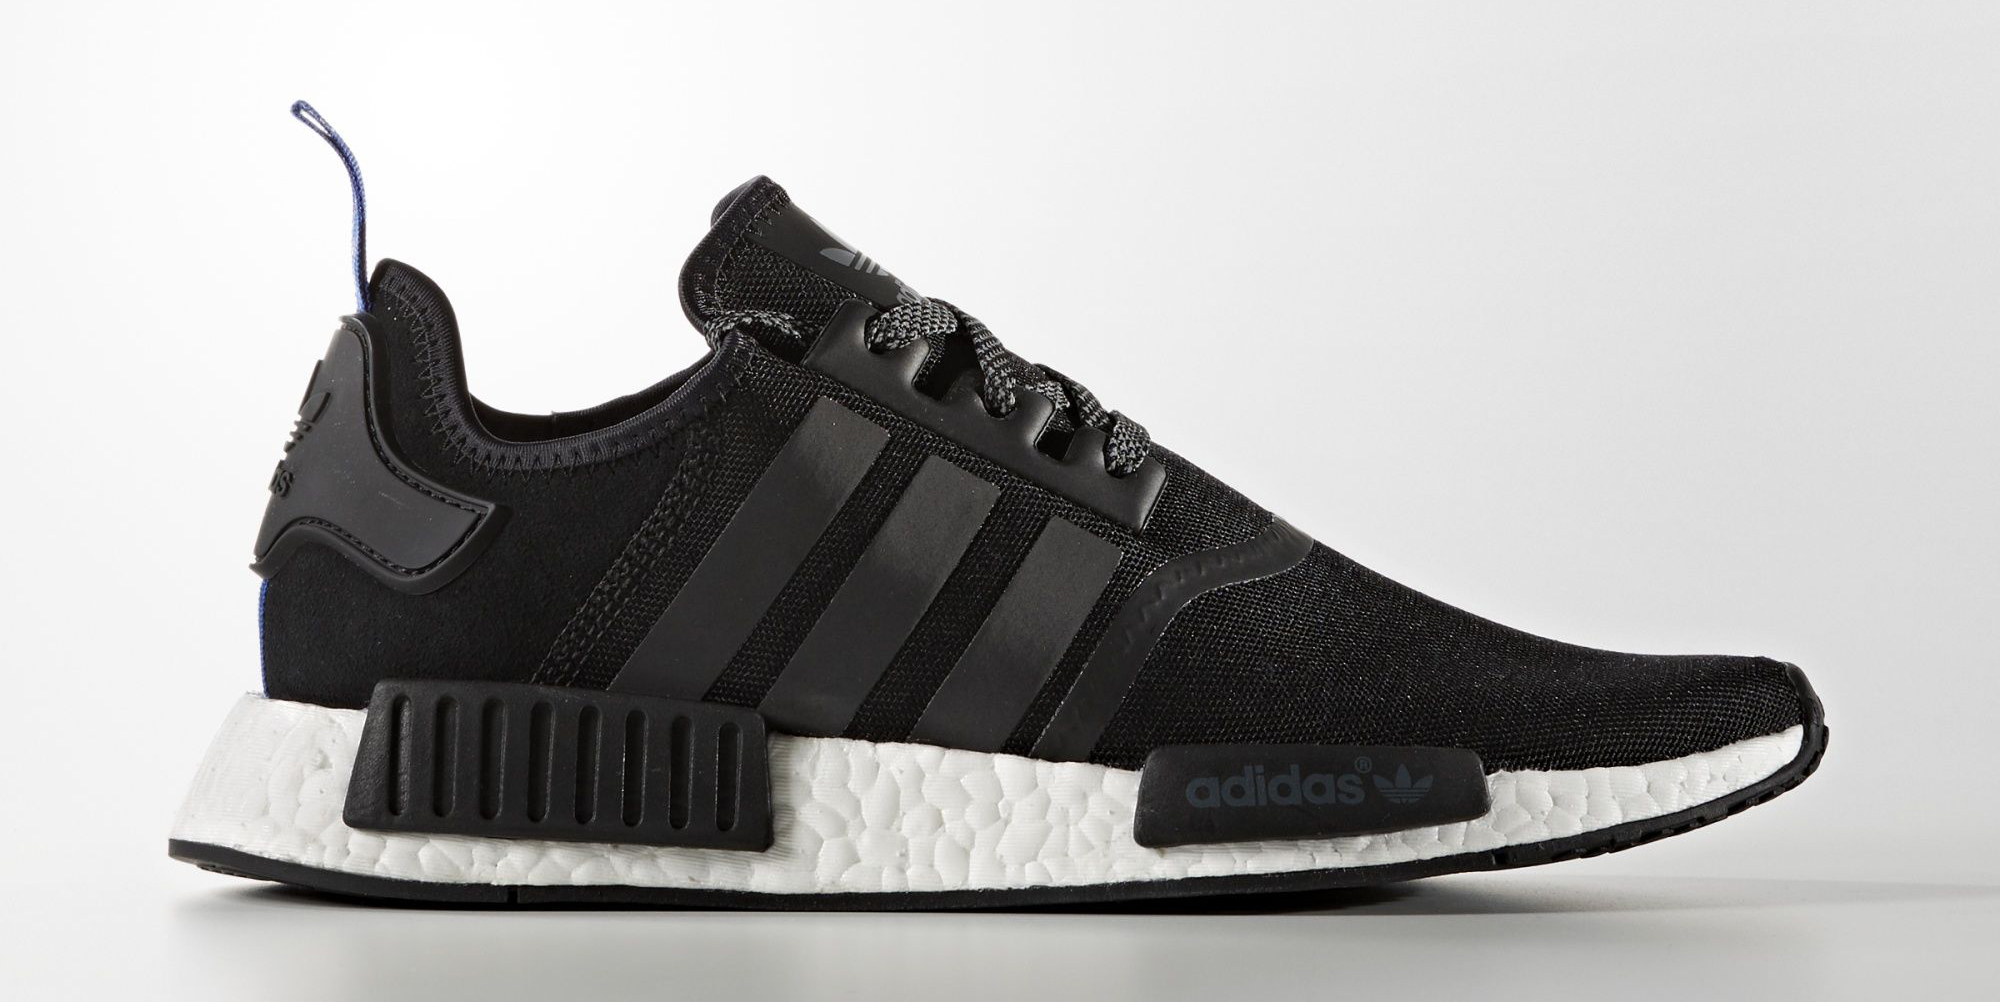 Adidas NMD Black October 2016